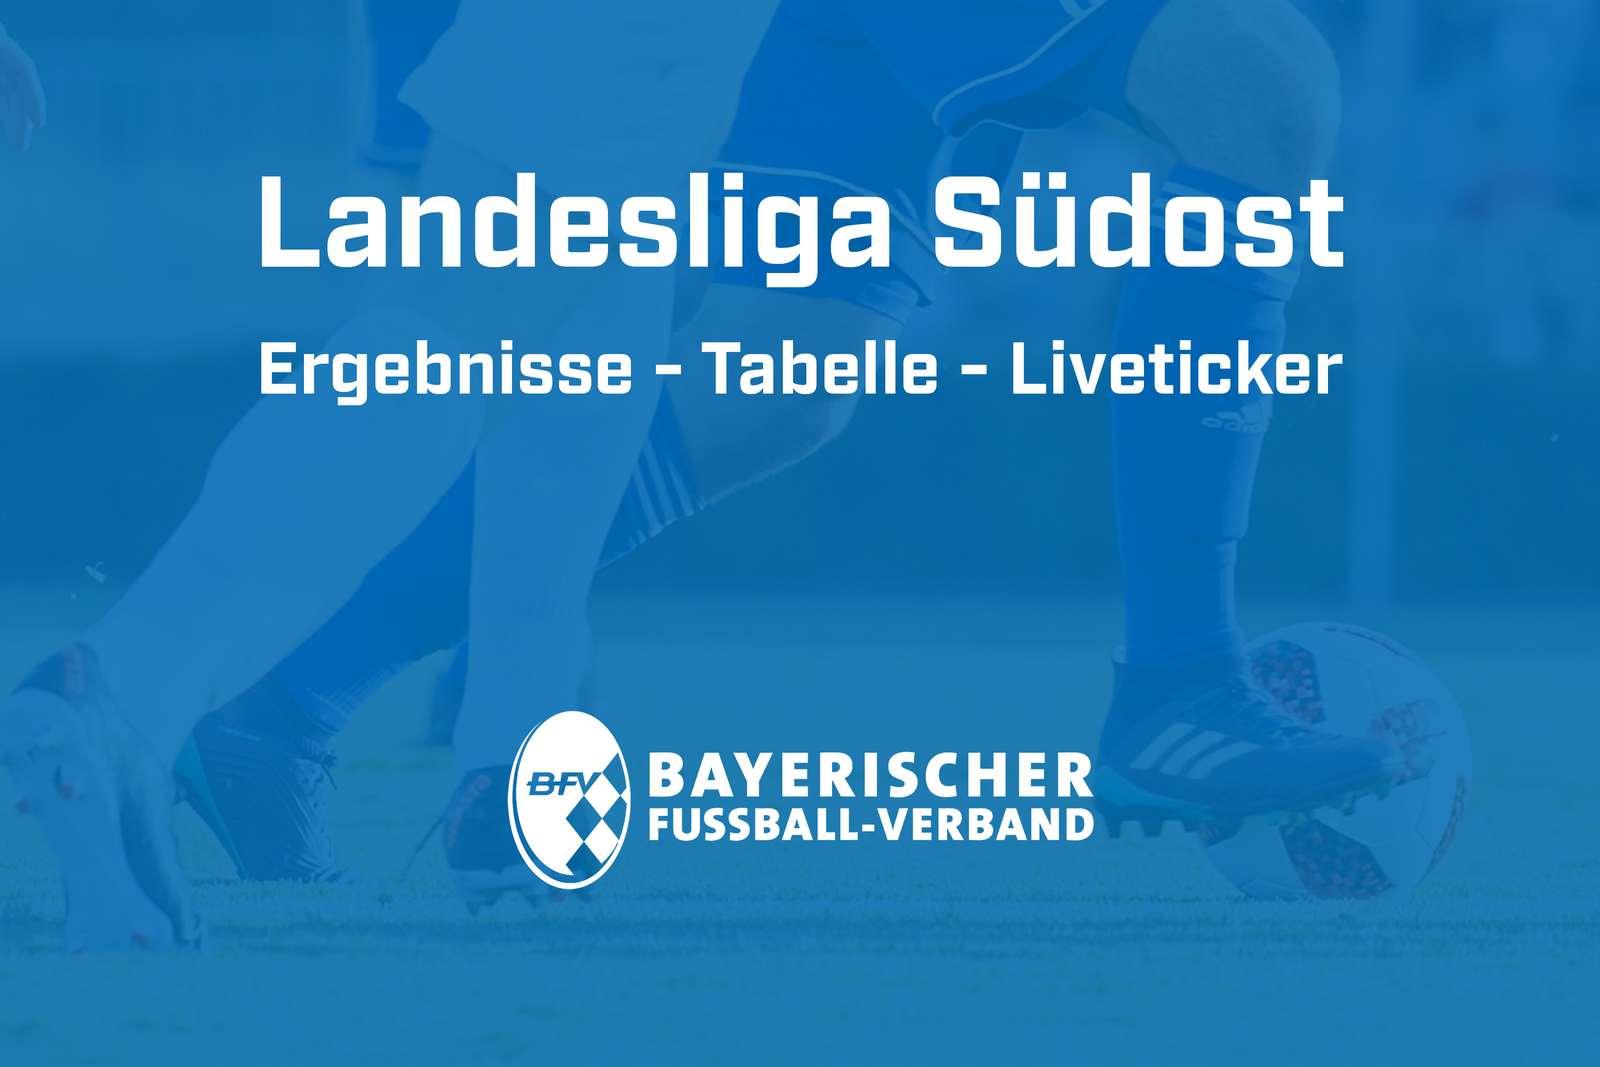 Landesliga Südost